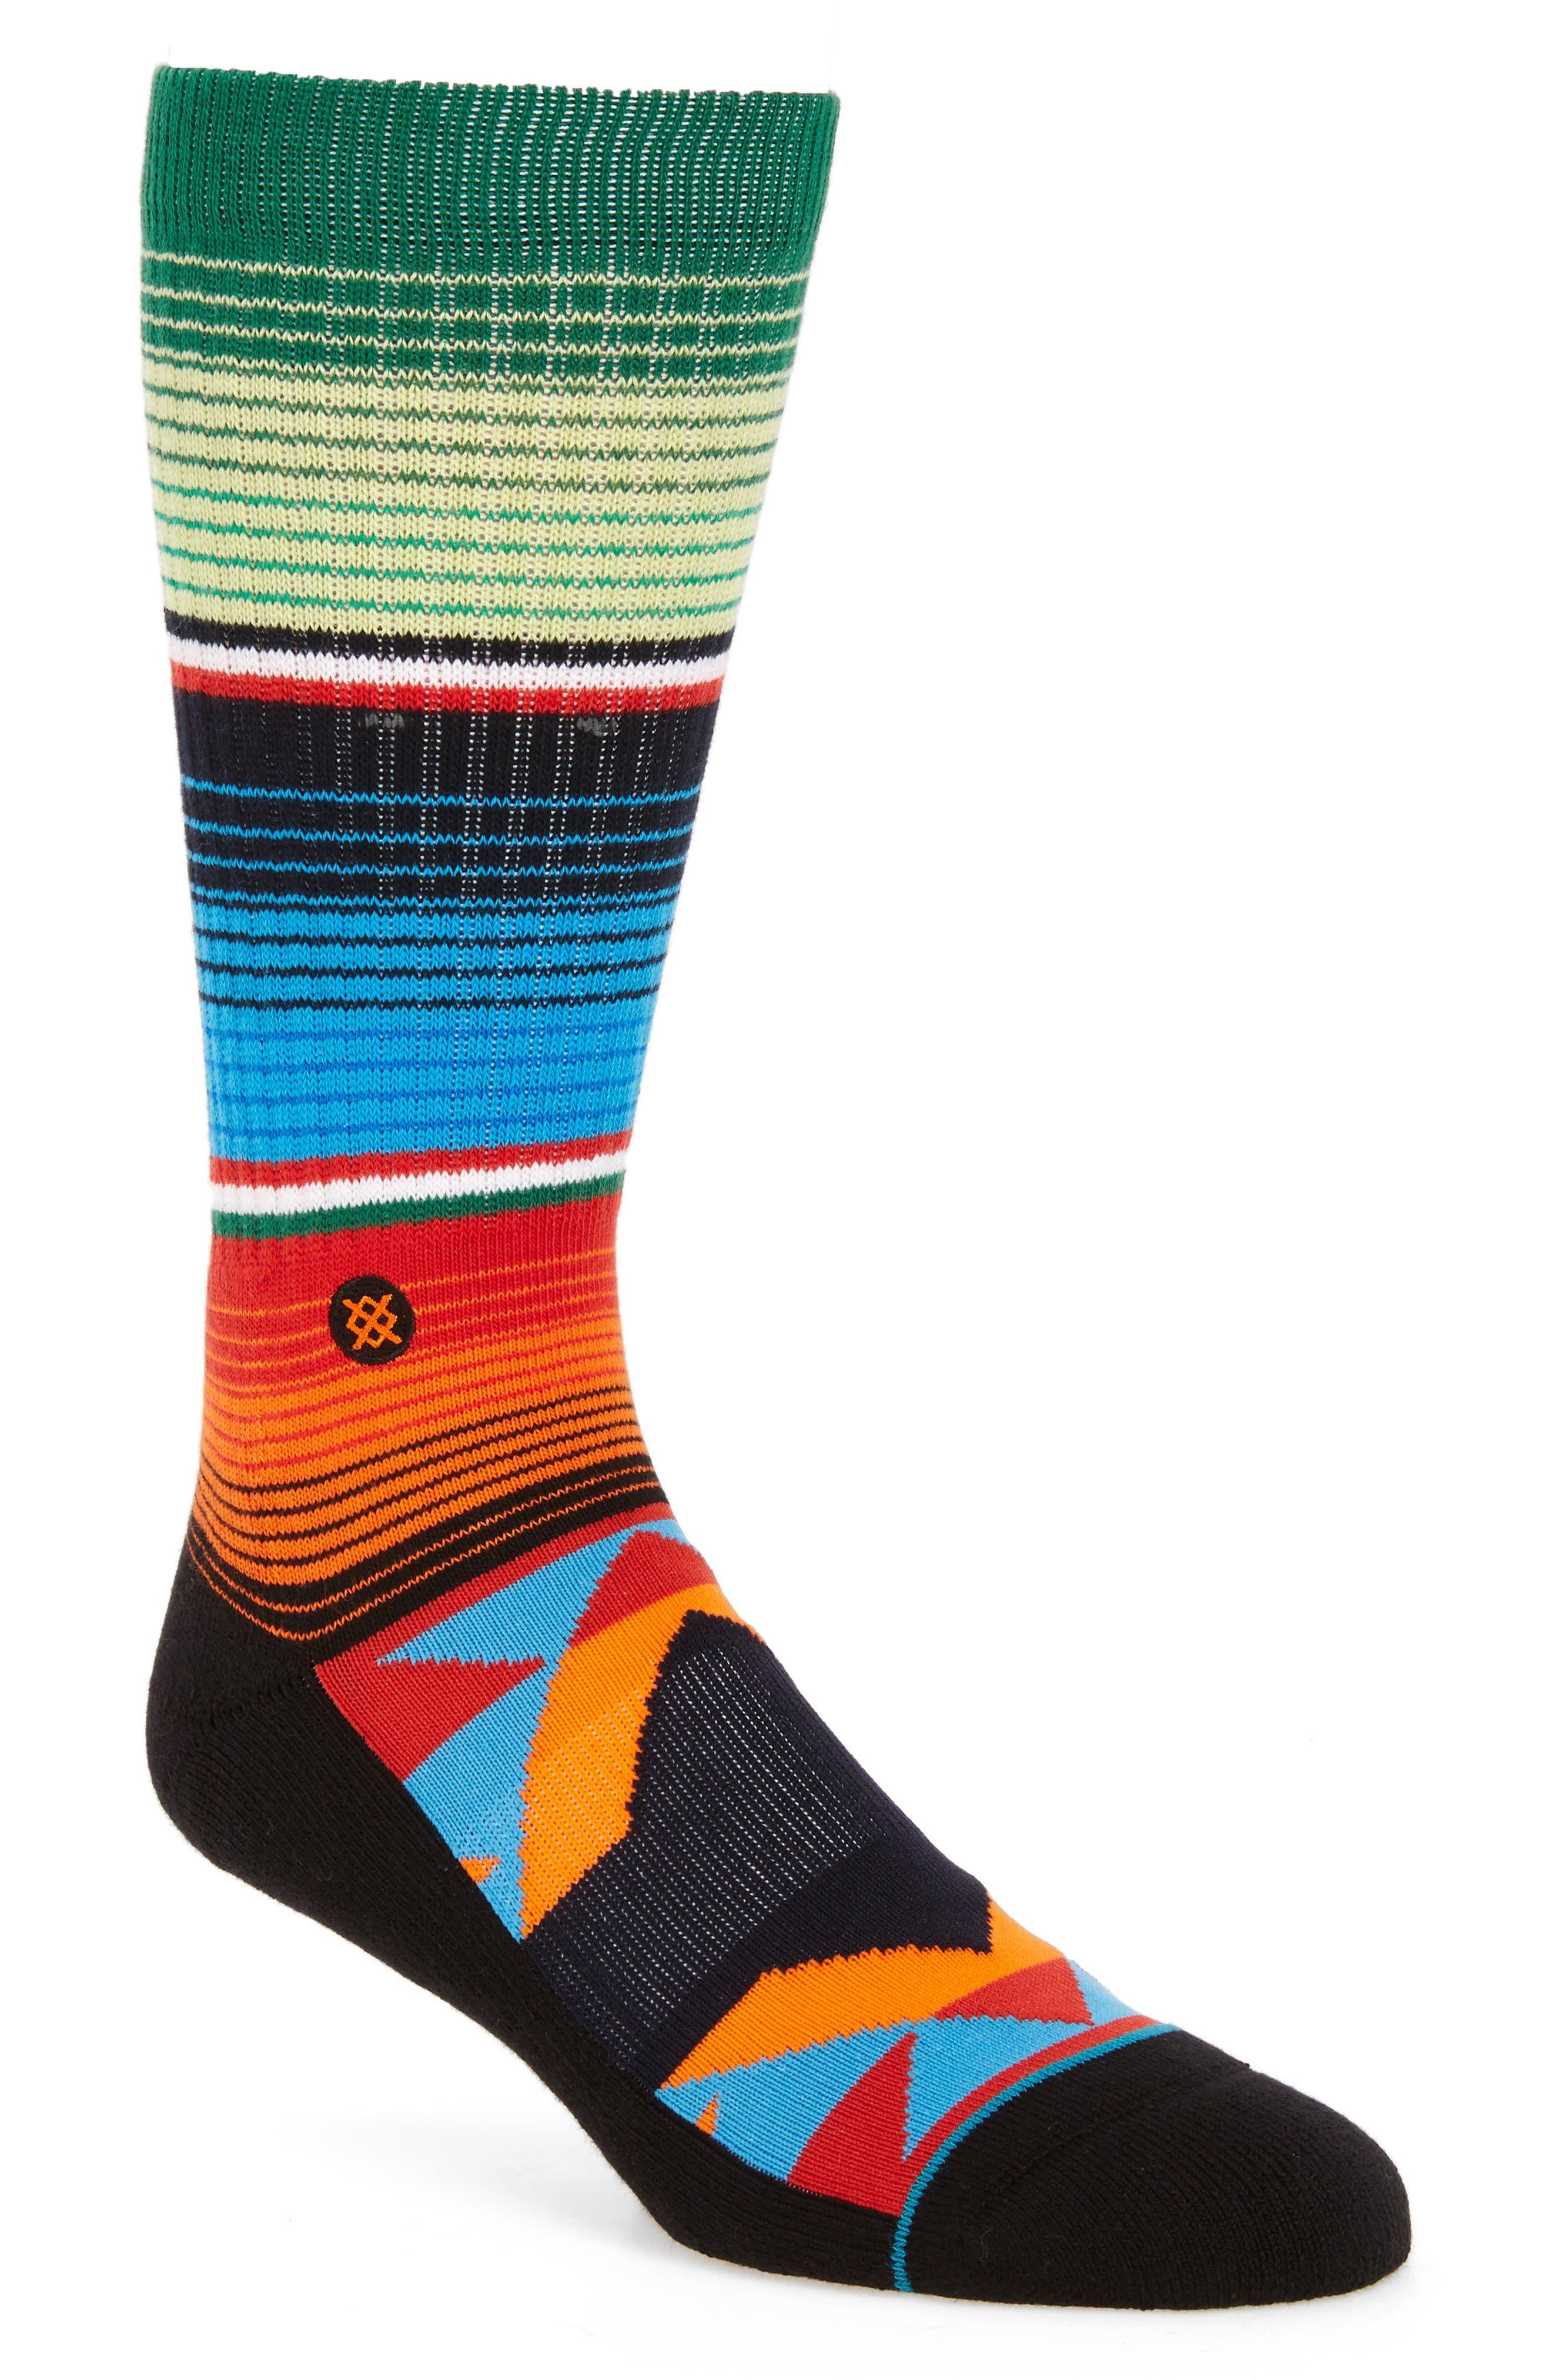 Alternate Image 1 Selected - Stance San Blas Crew Socks